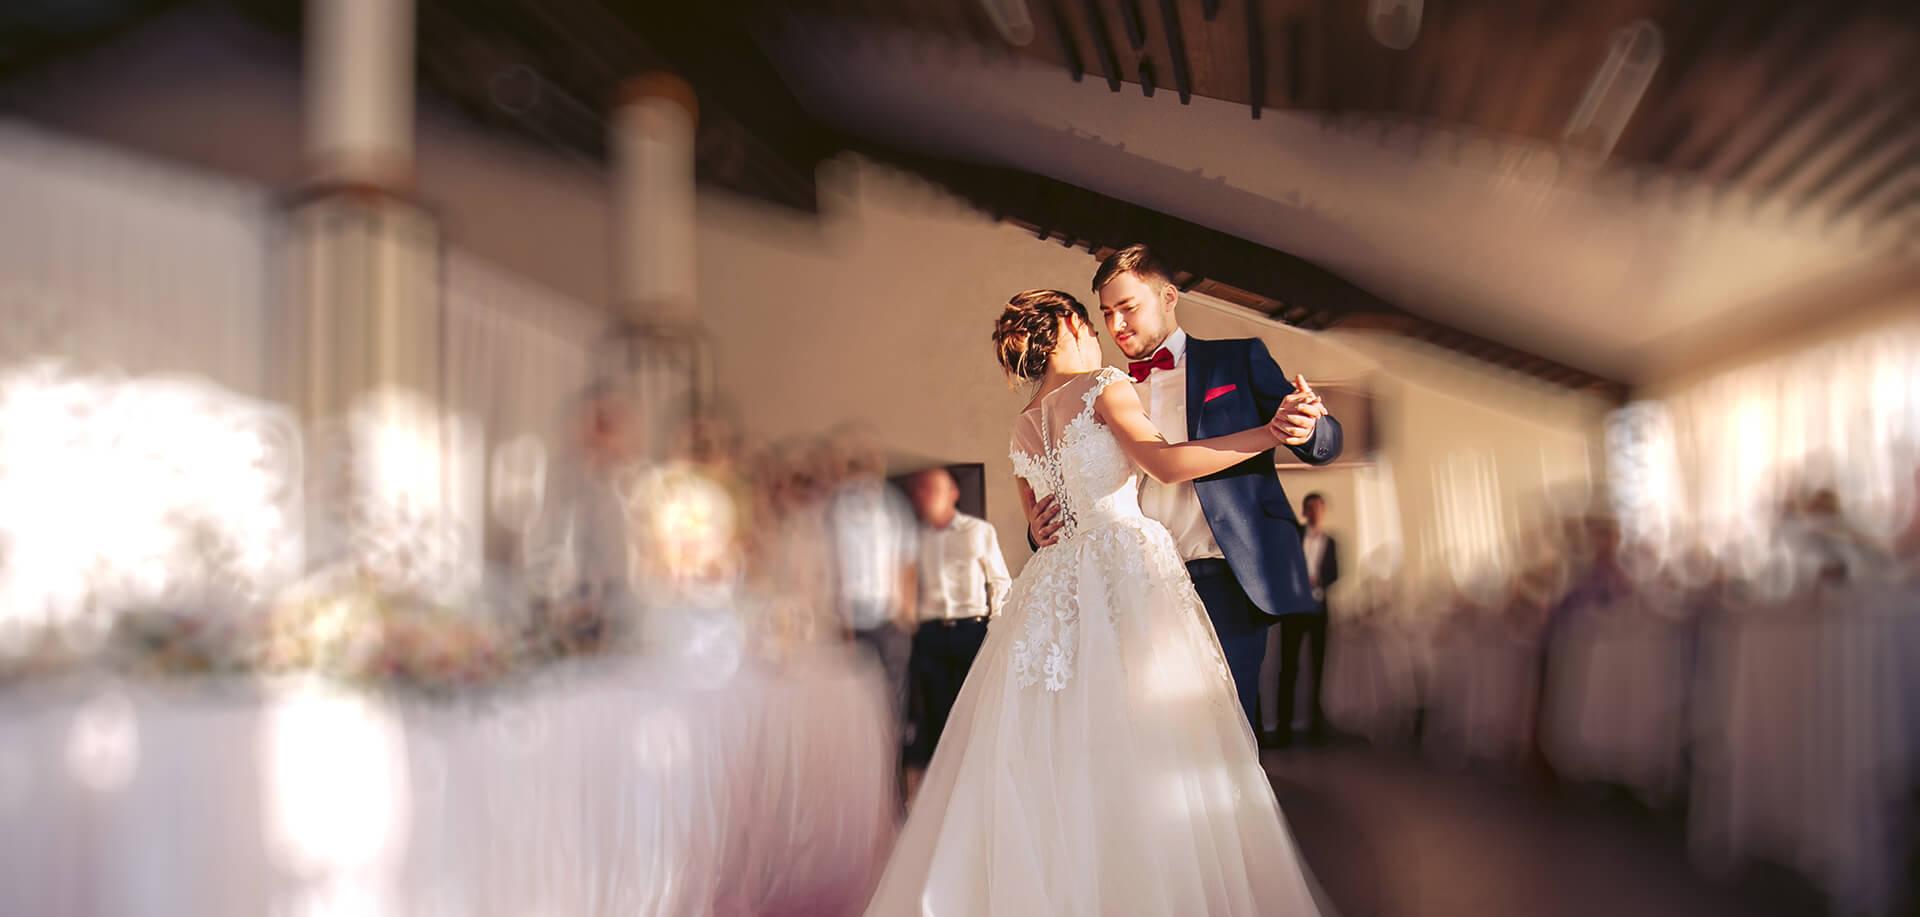 Weddings at Fox Hall